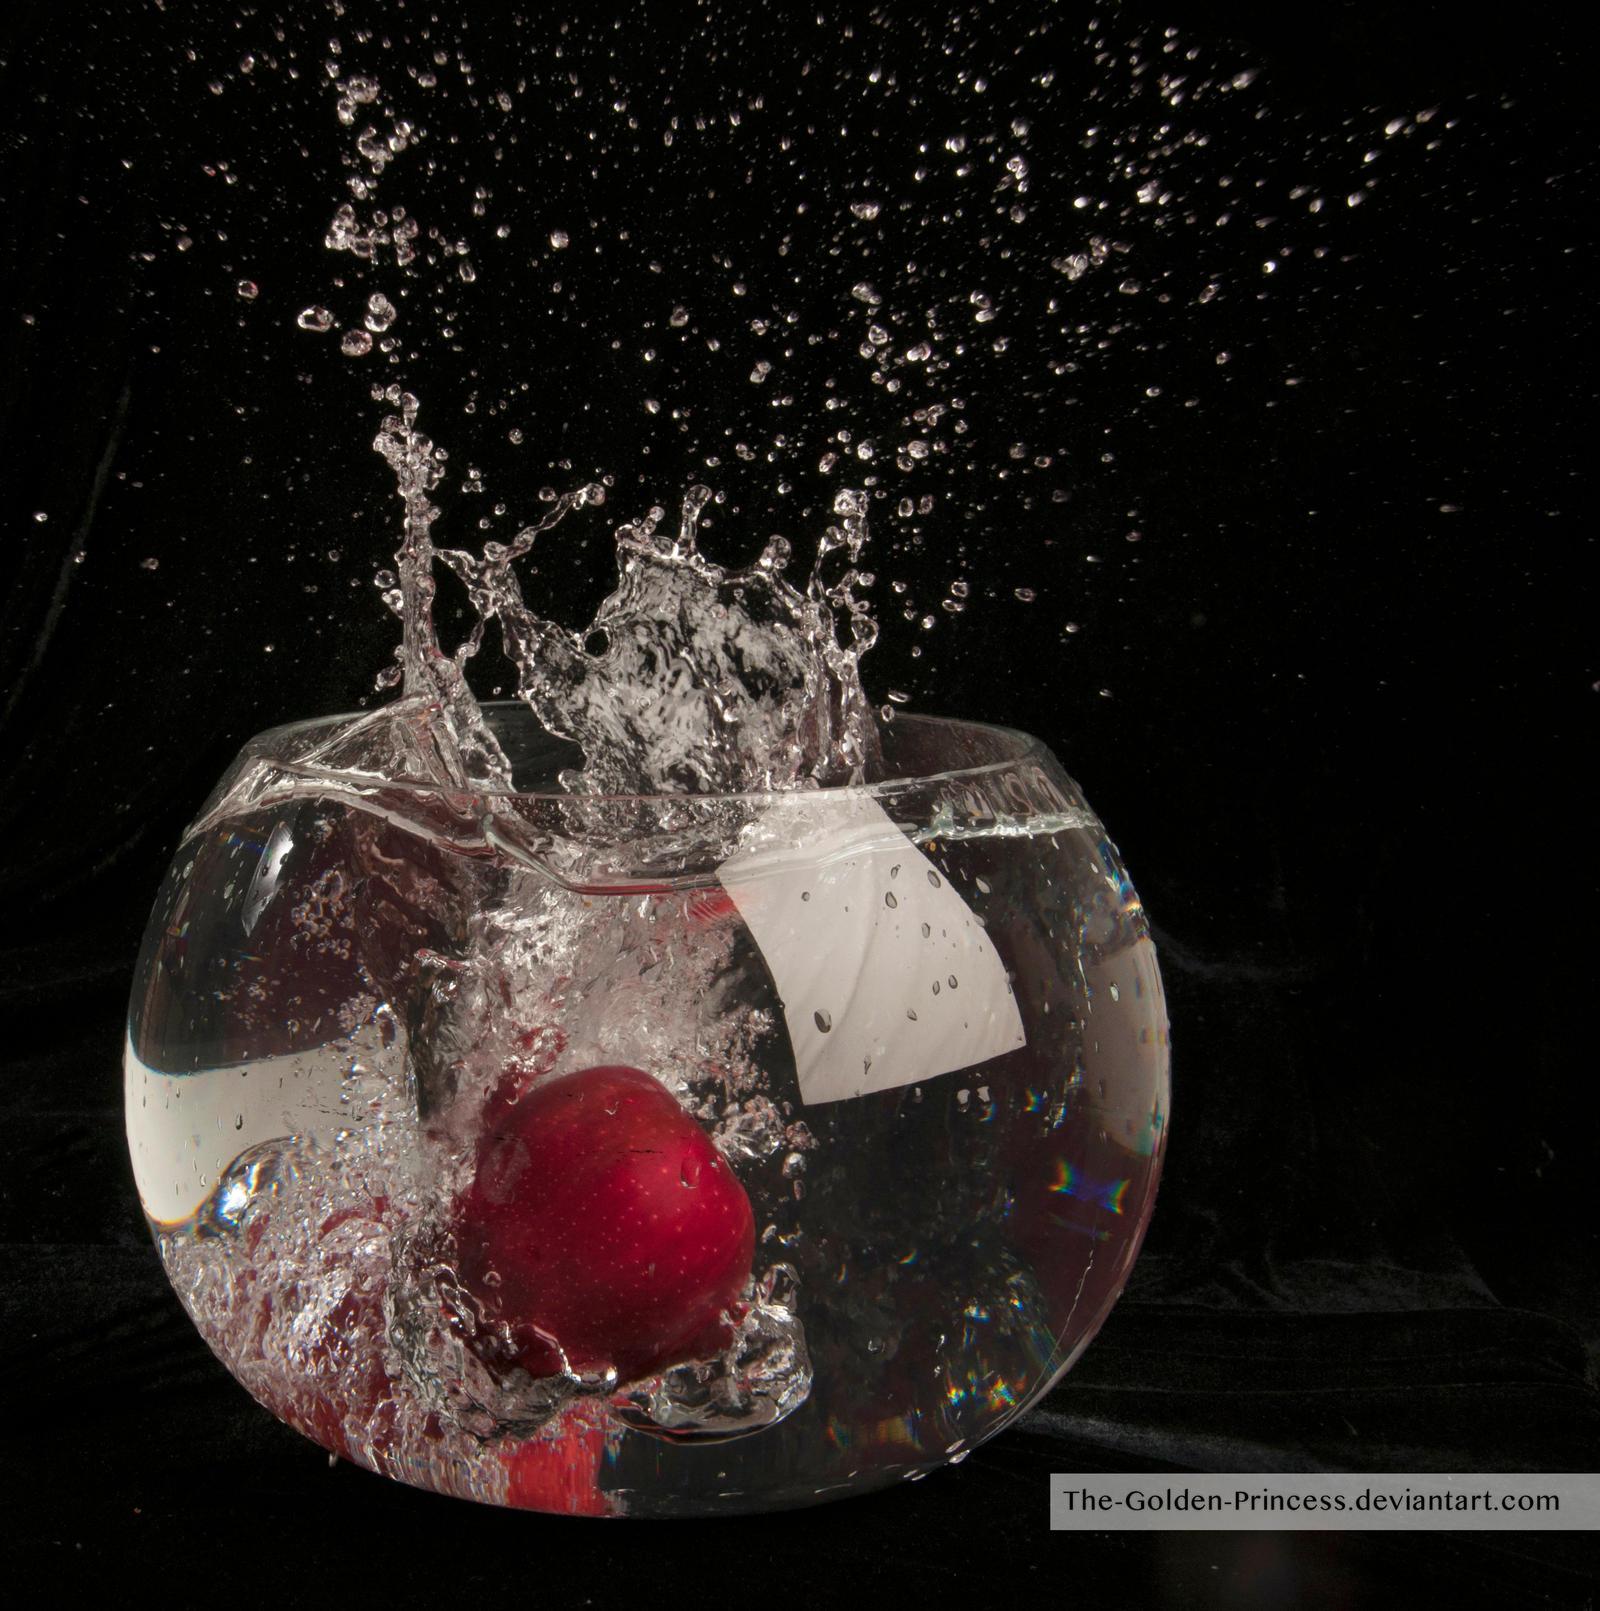 Splash day #2 by The-Golden-Princess